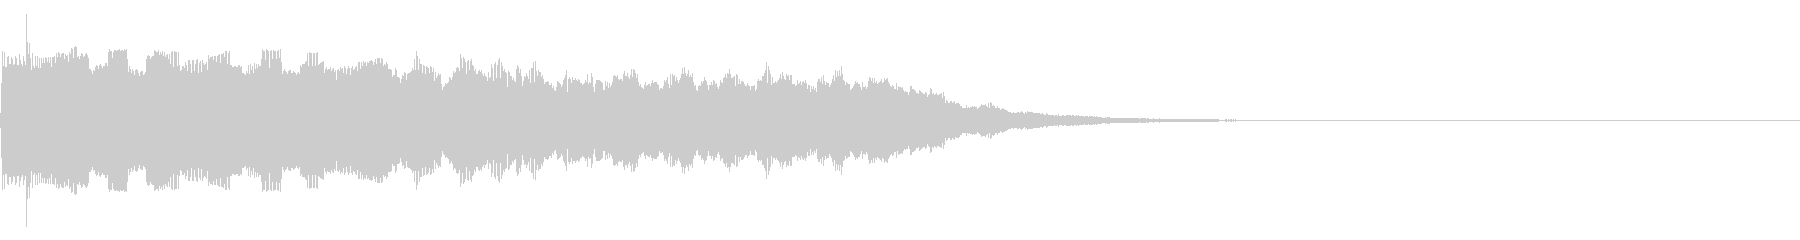 【SE 効果音】ピロピロの未再生の波形